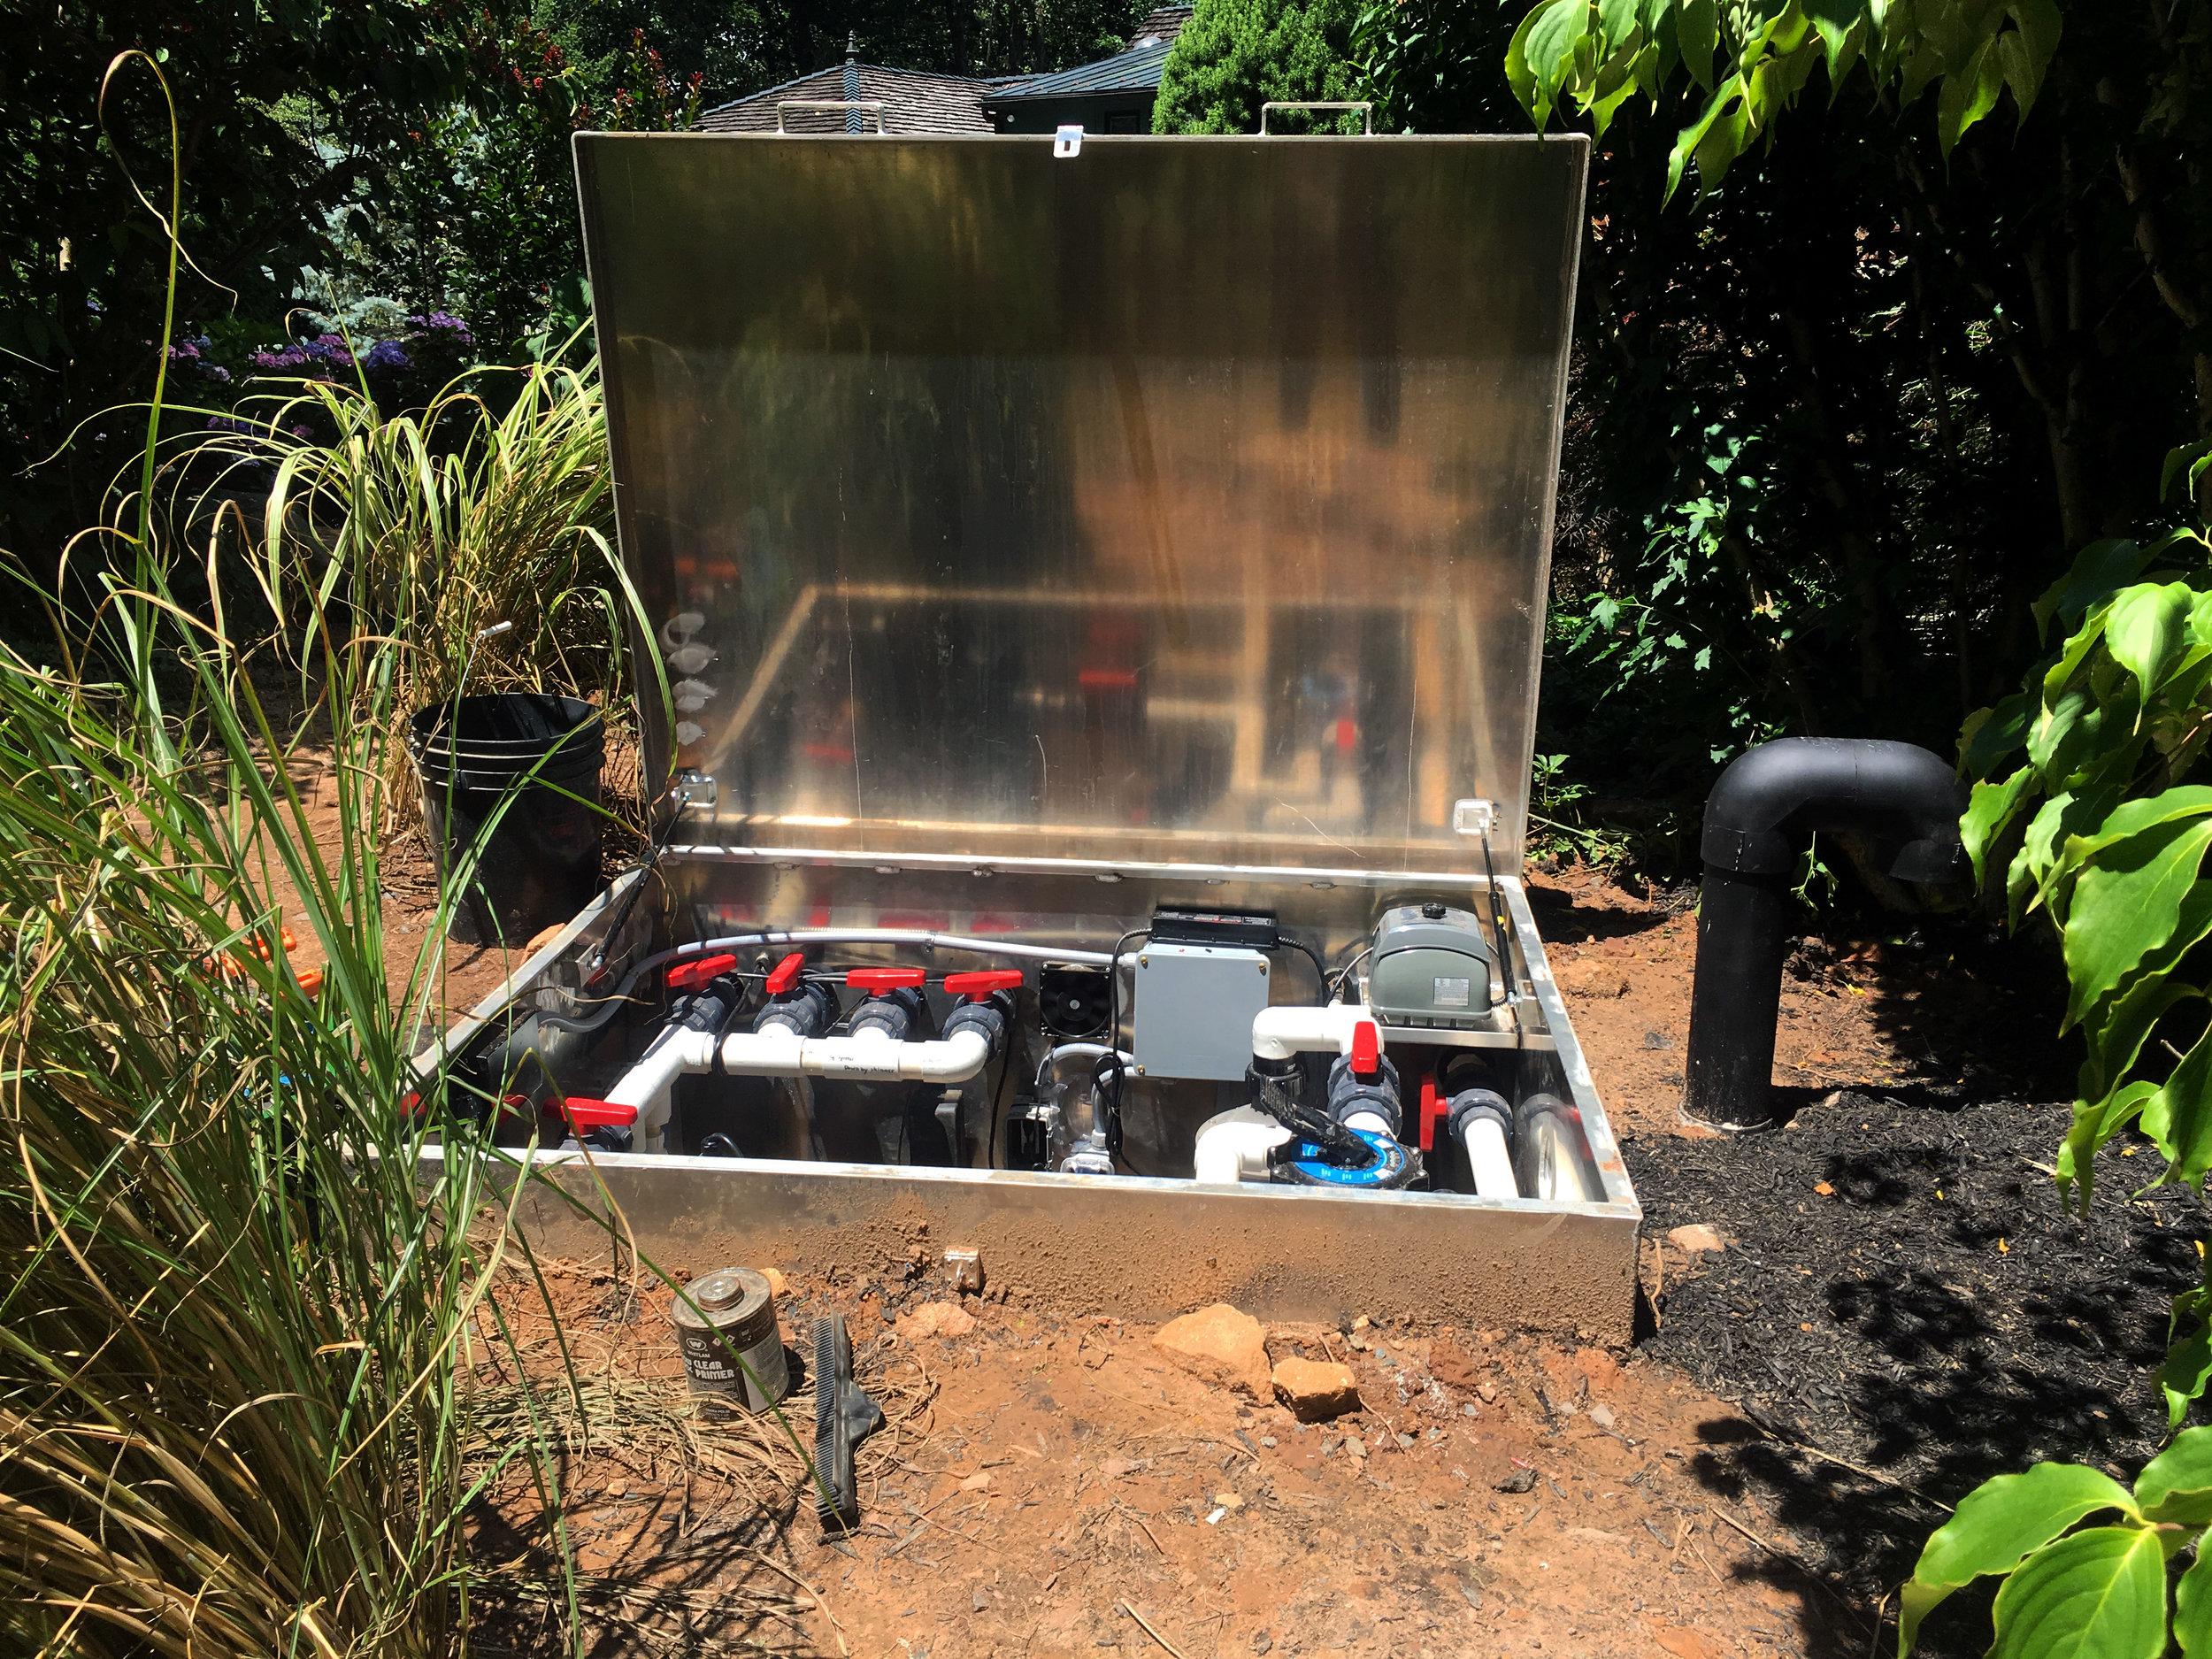 Maintenance_vault_pond plumbing_custom filtration_04.jpg